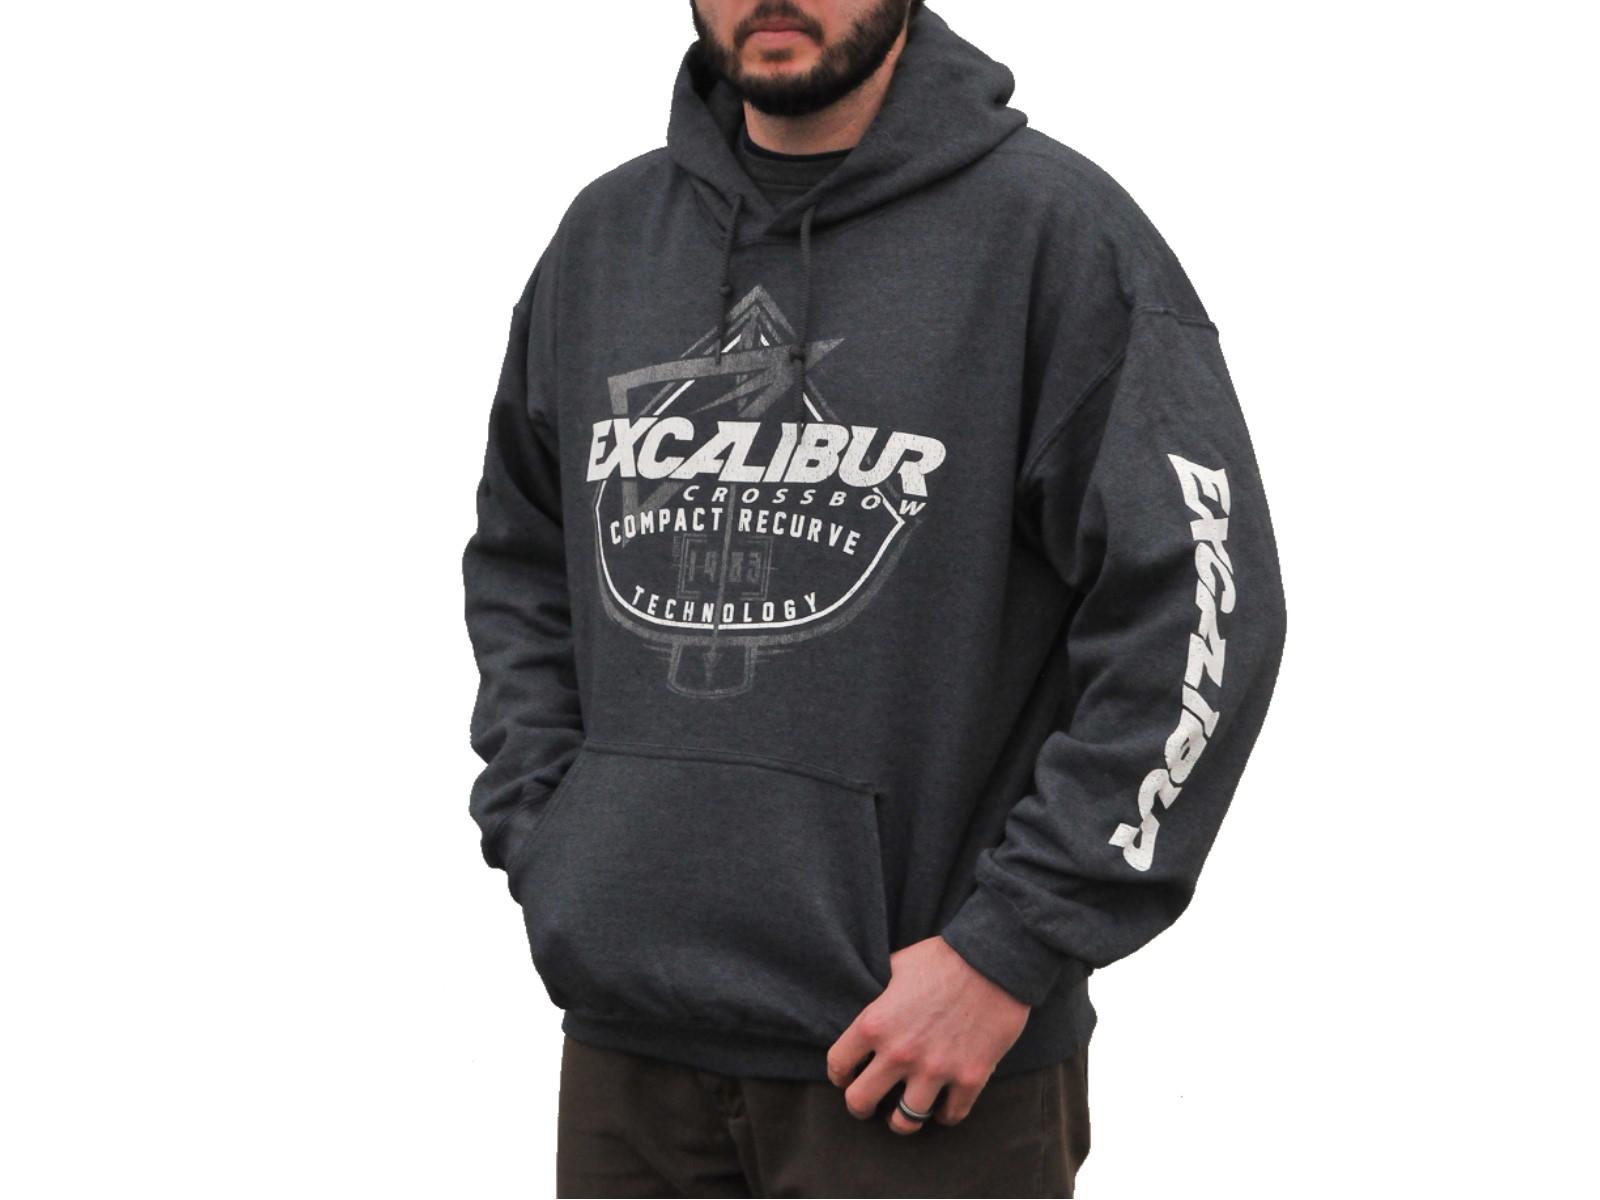 Excalibur Hoodie (Grey)